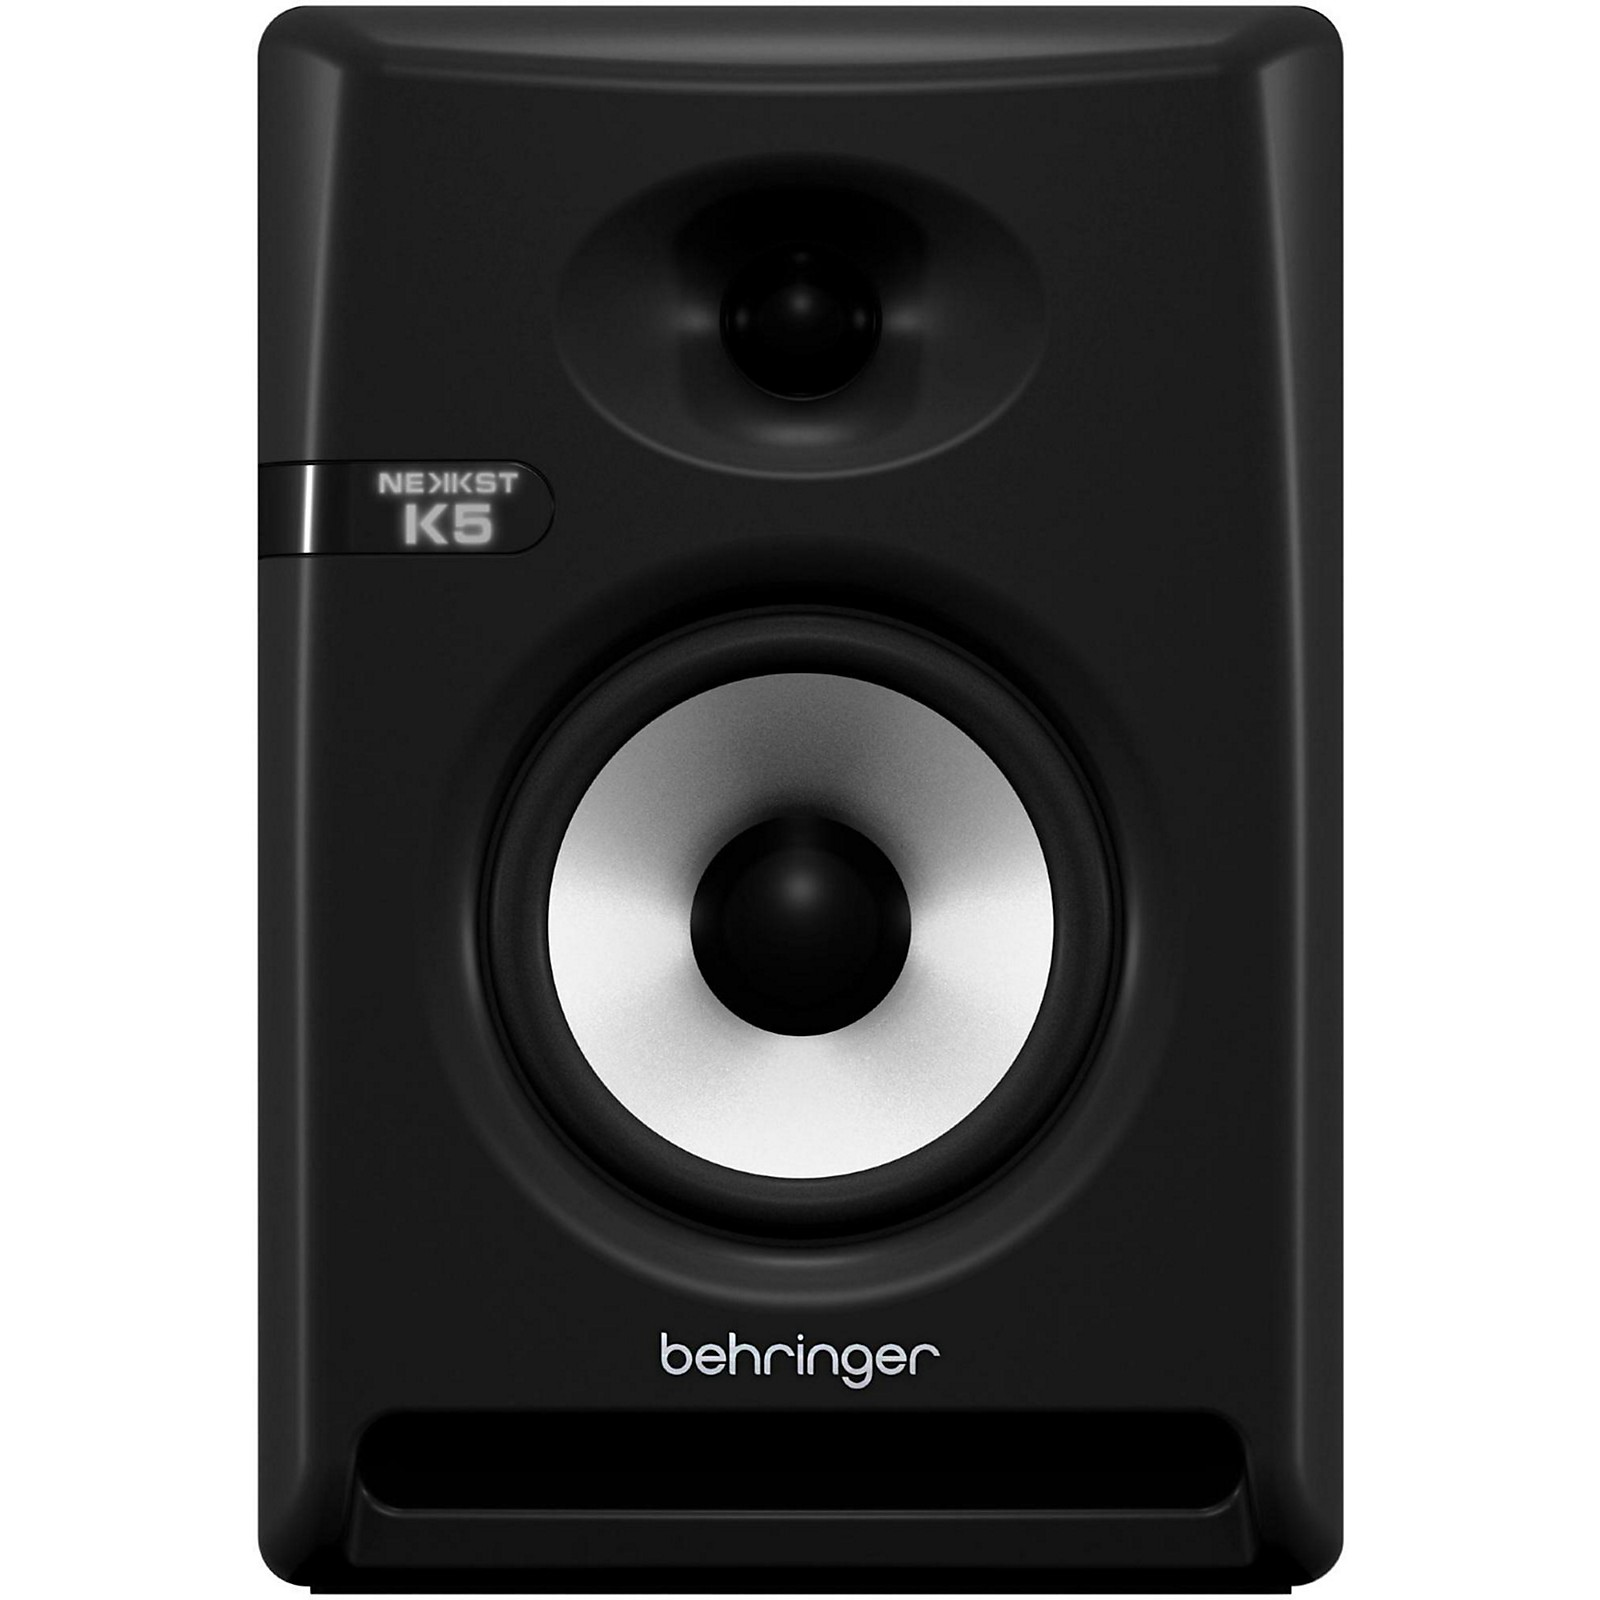 Behringer NEKKST K5 Audiophile Bi-Amped 5